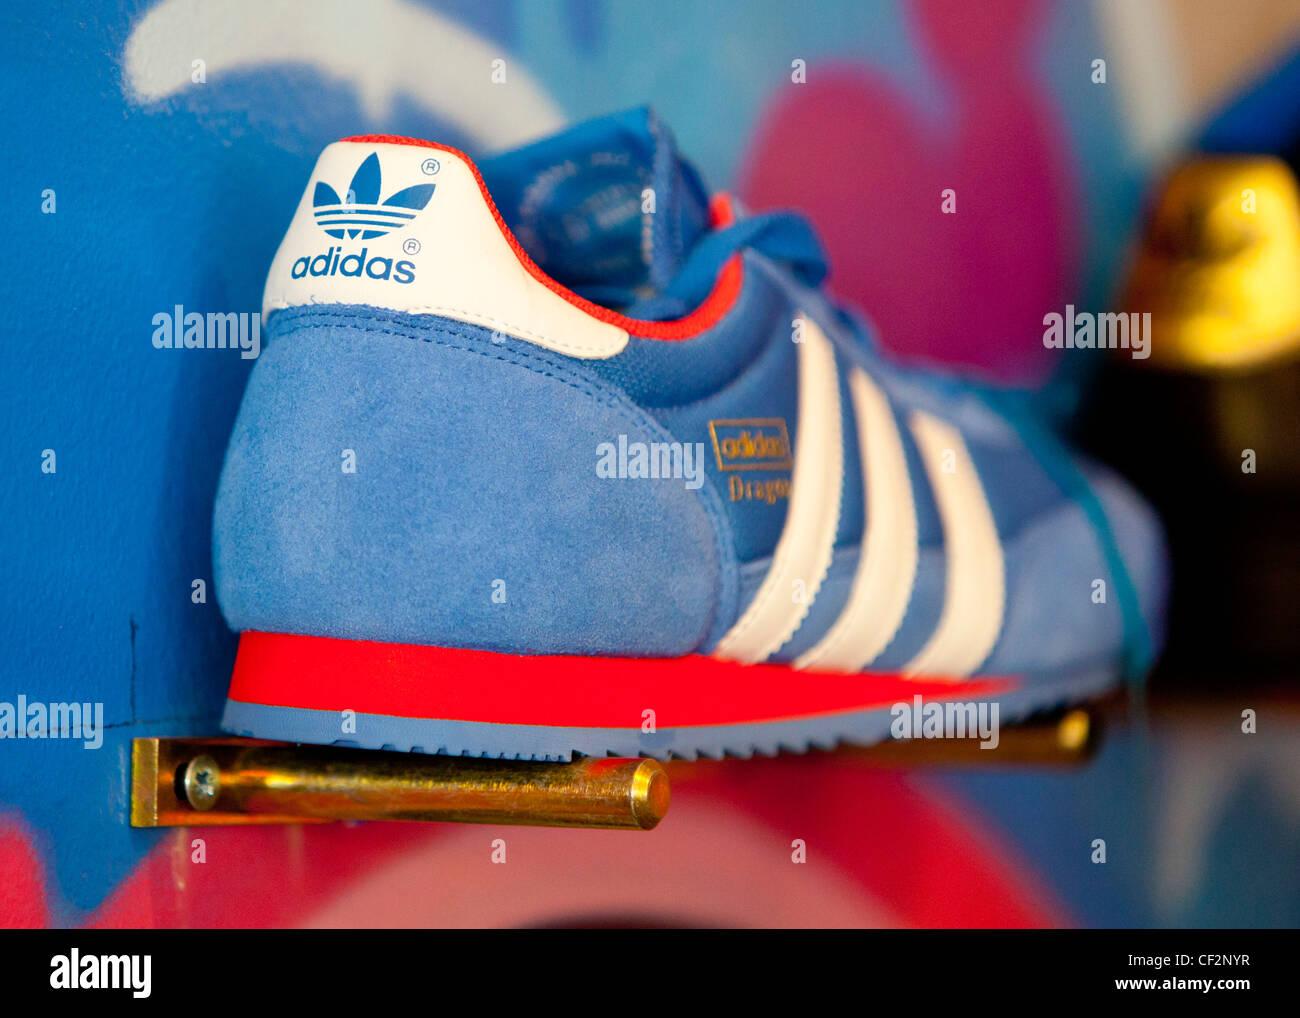 162e47feb16a Adidas Shoes Display Stockfotos   Adidas Shoes Display Bilder - Alamy